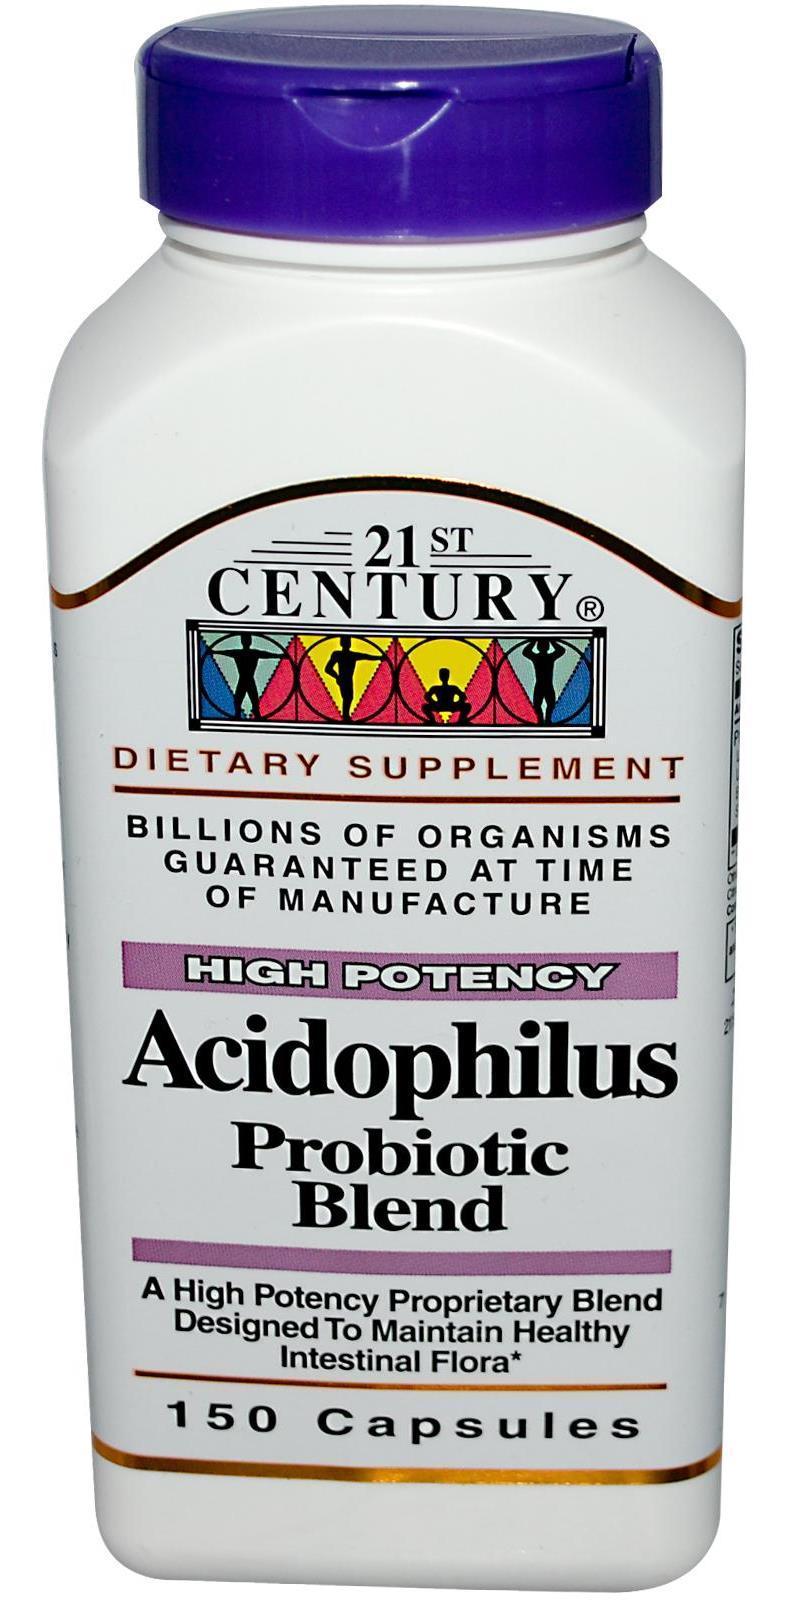 21st Century Acidophilus Probiotic Blend Caps 150's